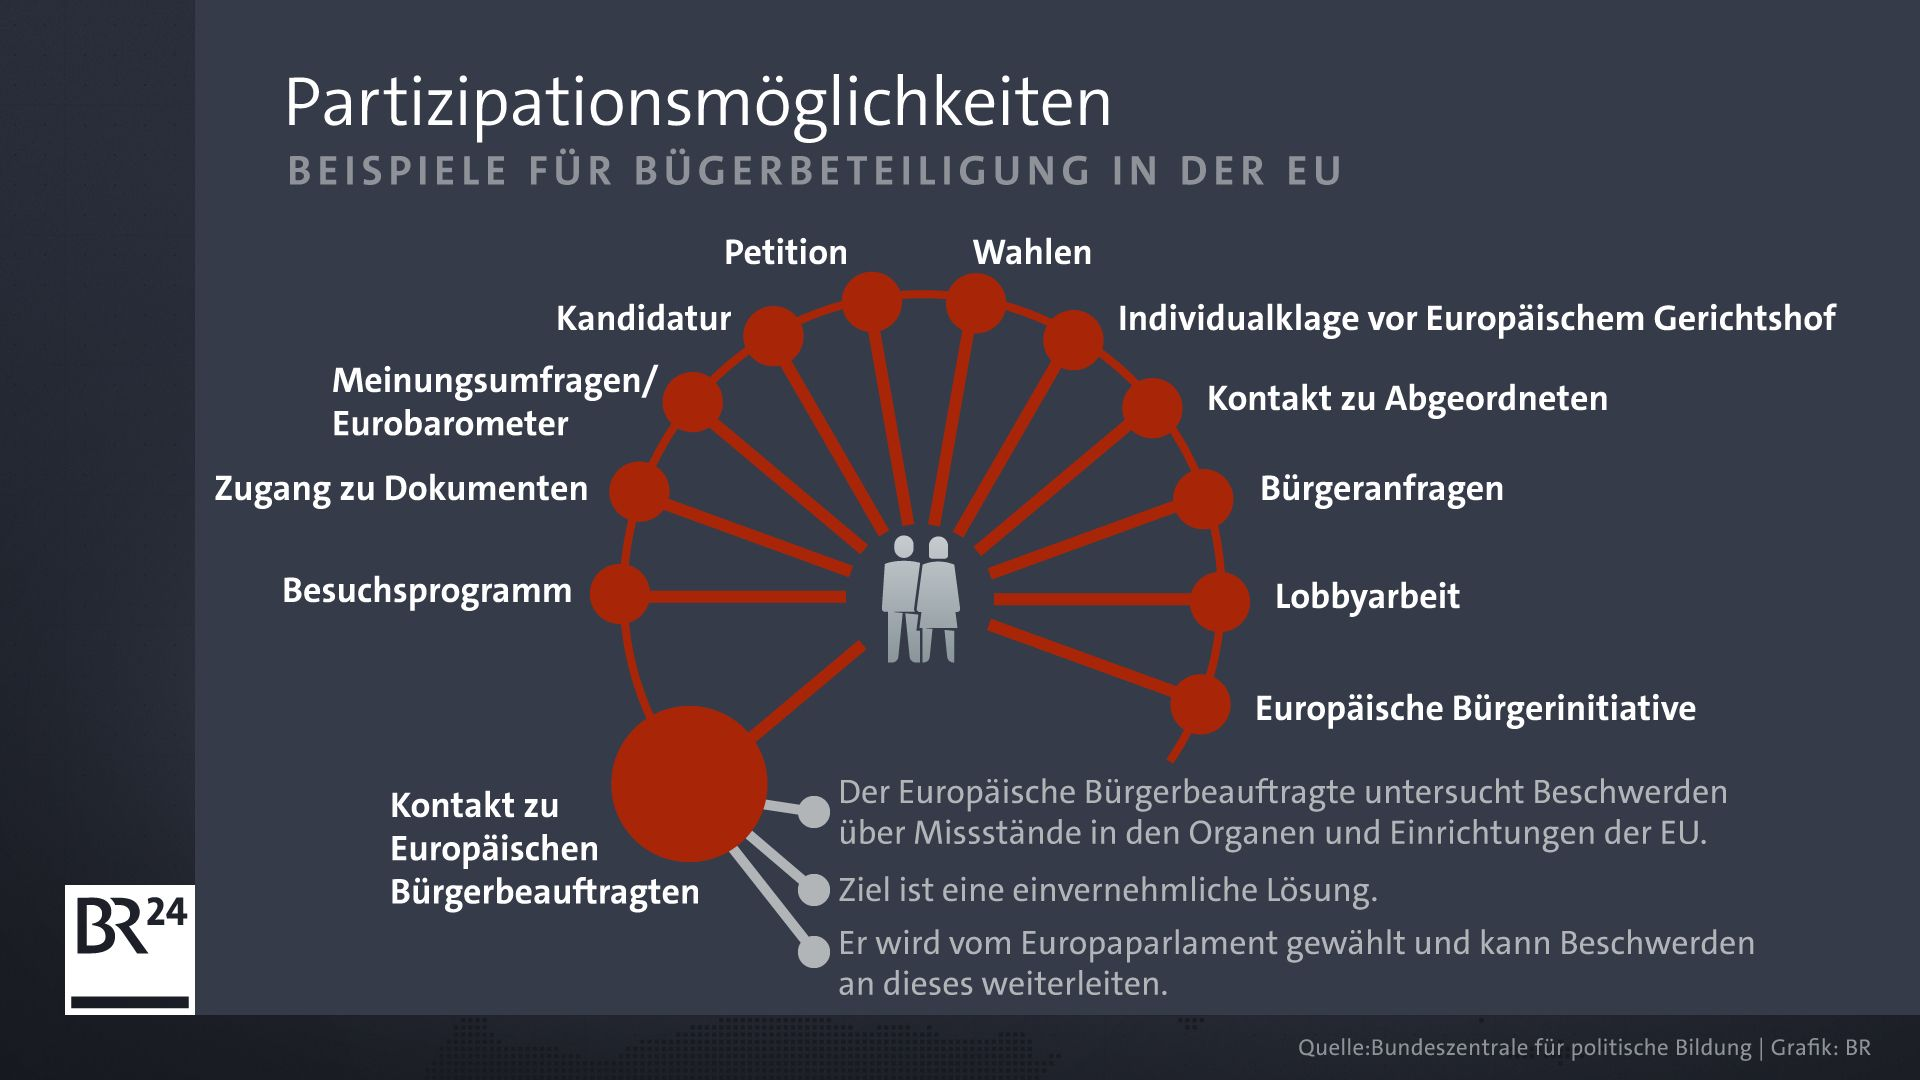 Bürgerbeteiligung in der EU